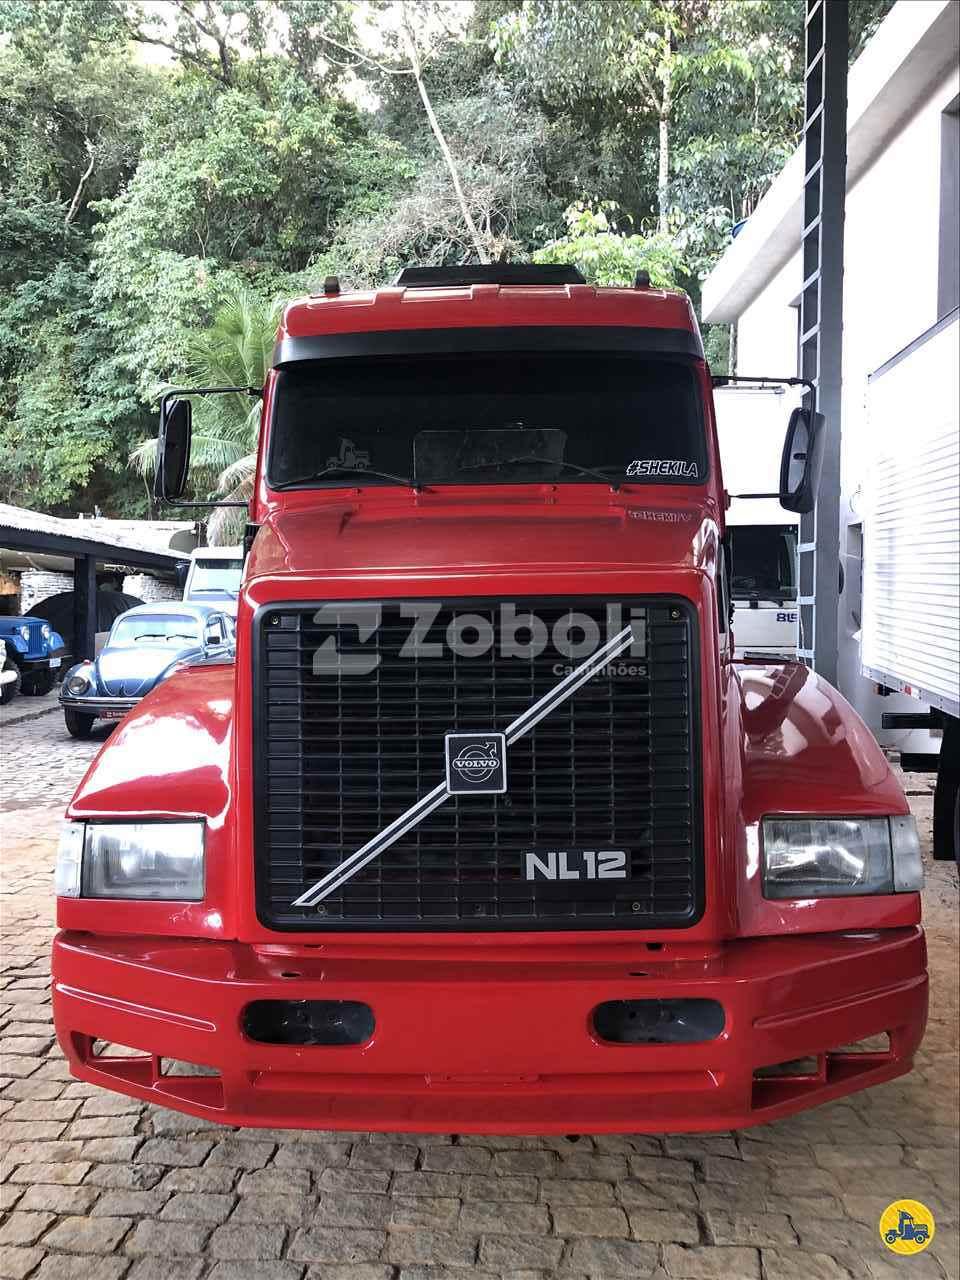 CAMINHAO VOLVO VOLVO NL12 360 Cavalo Mecânico Toco 4x2 Zoboli Caminhões CASTELO ESPÍRITO SANTO ES